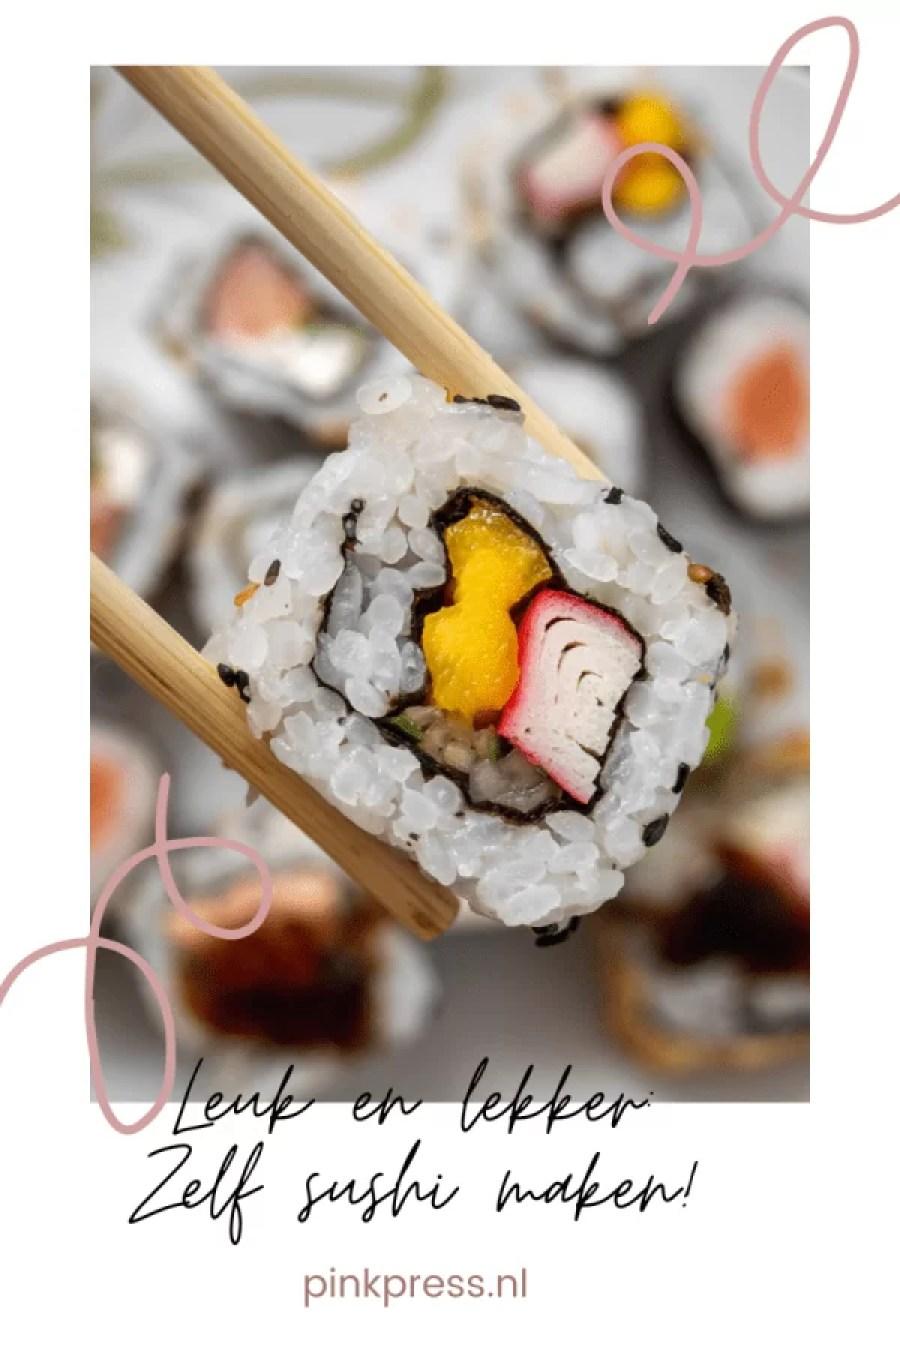 4C12B185 CD3D 4074 956A D92C1EFEB09D - Zelf sushi maken doe je zo!